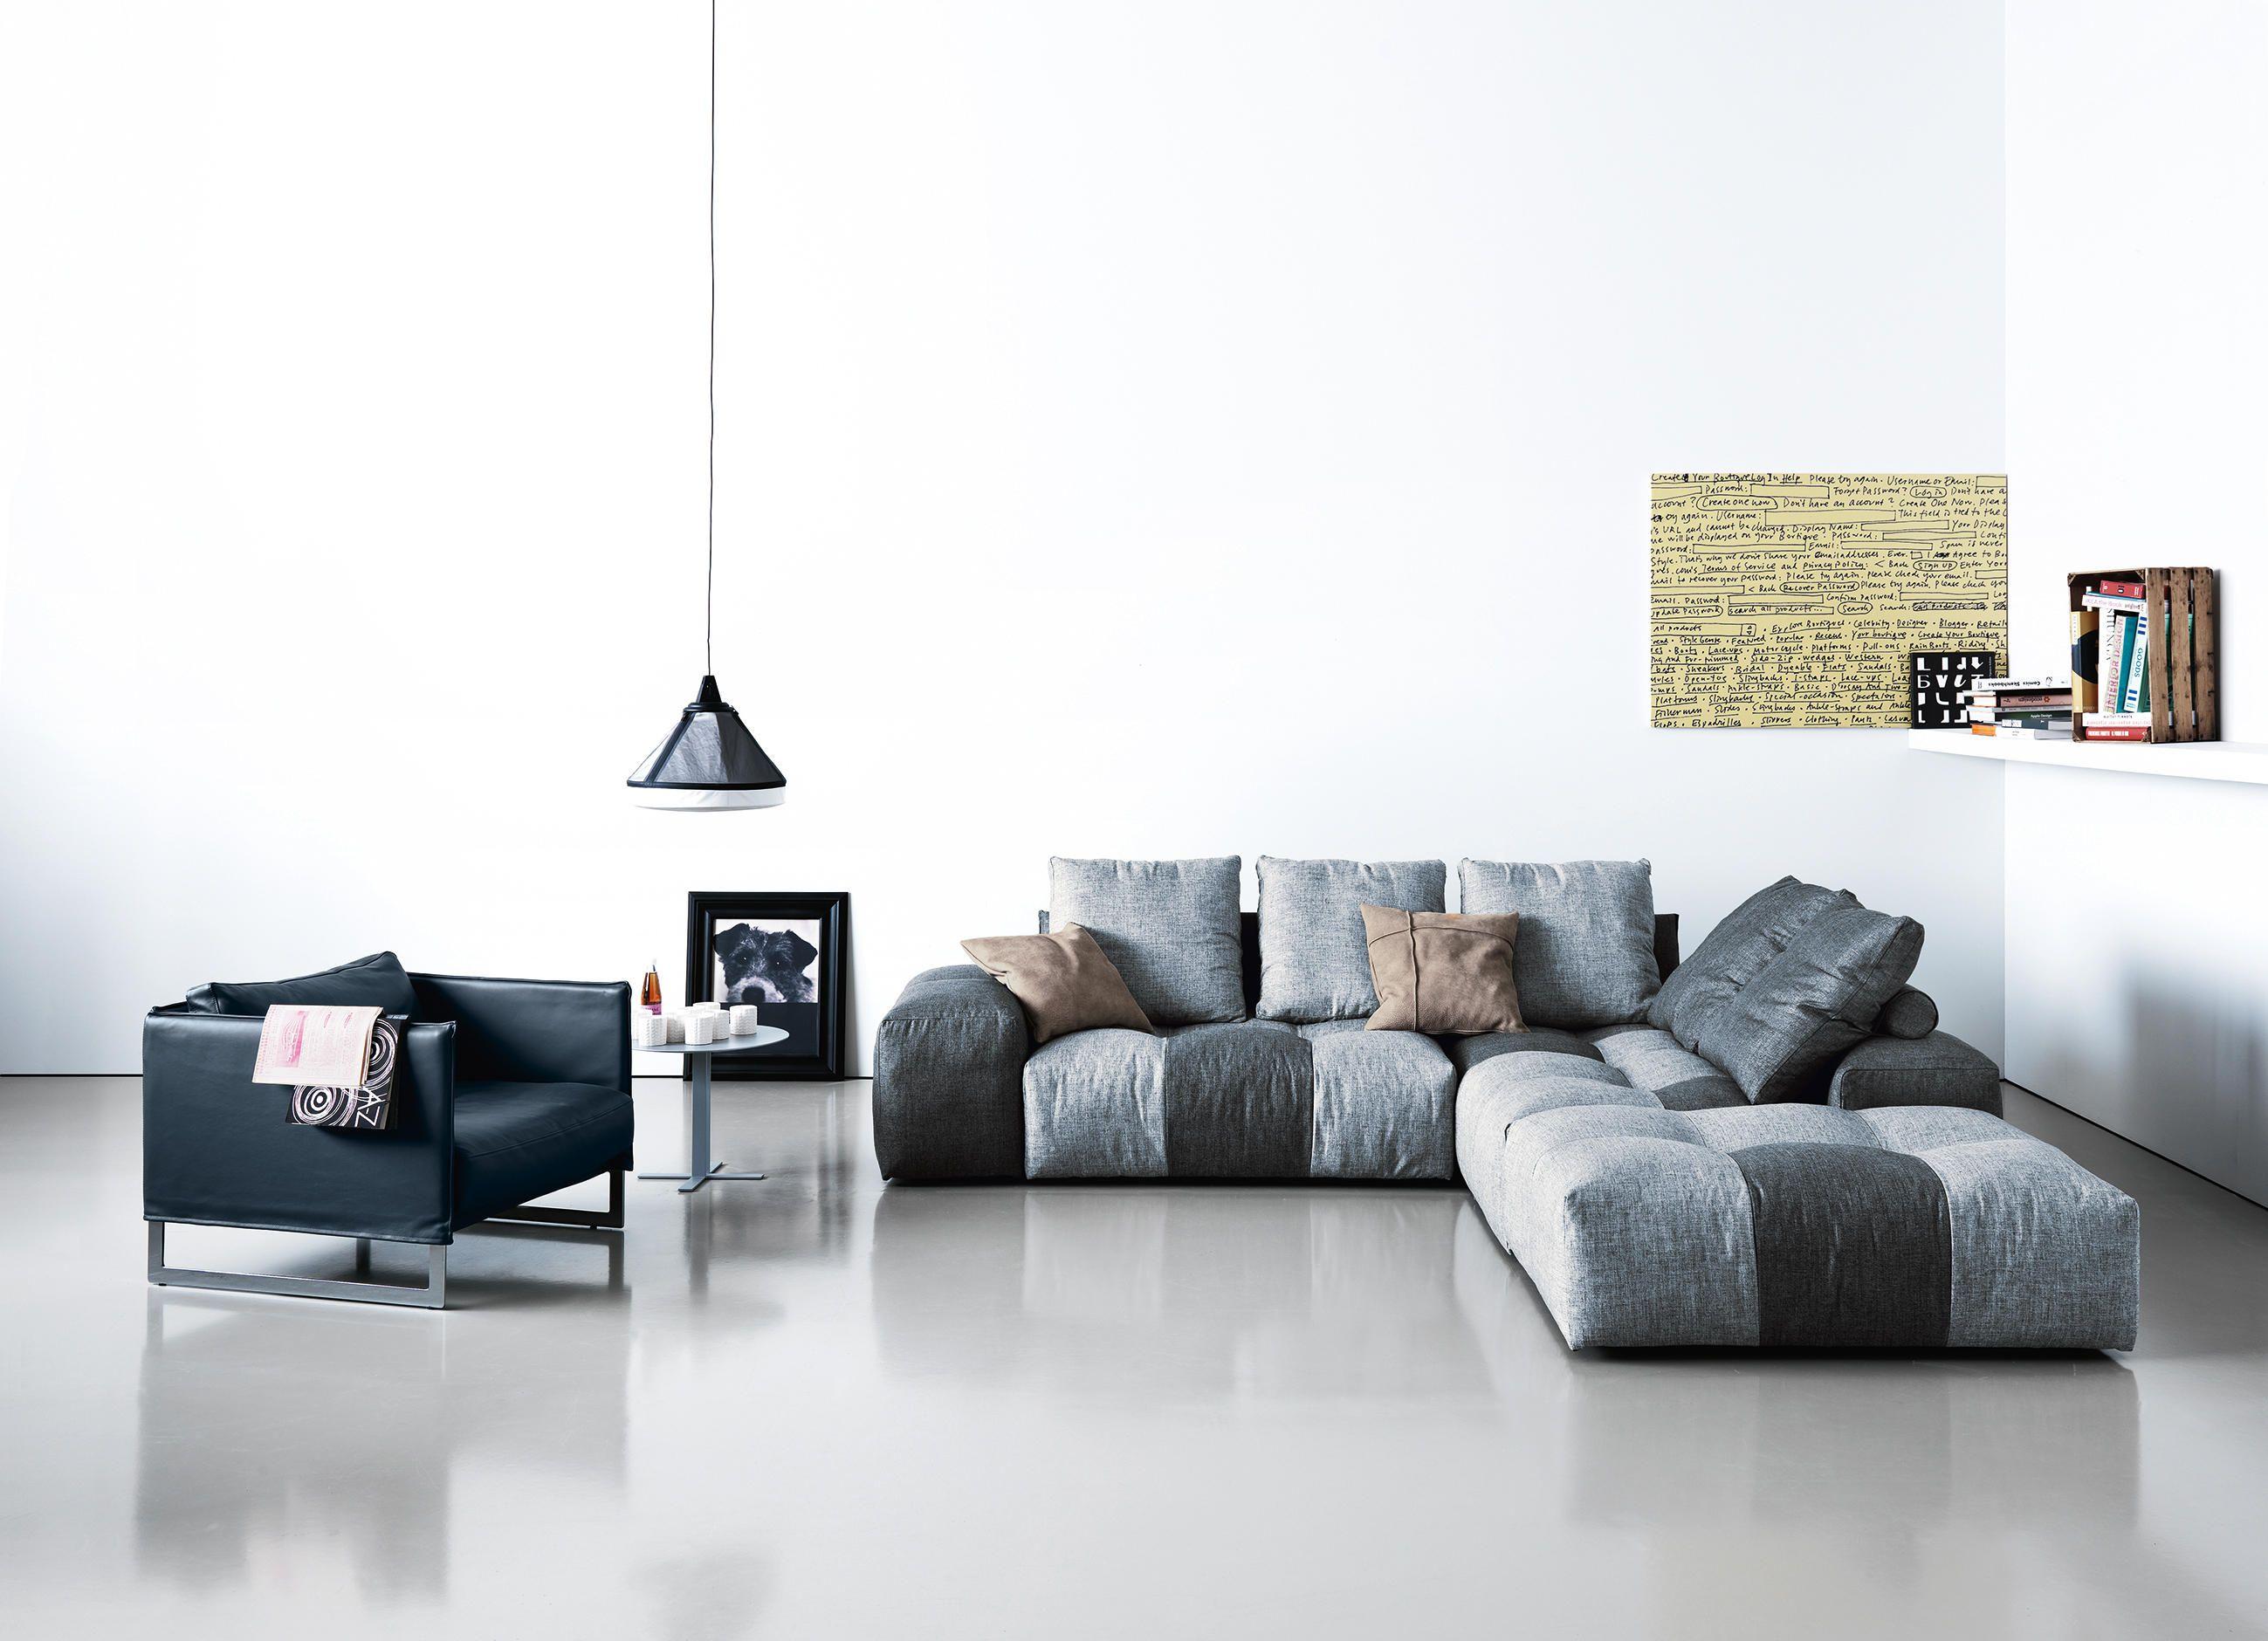 Pixel Sofa Designer Sofas From Saba Italia All Information High Resolution Images Cads Catalogues Con Sofa Design Unique Sofas Fabric Sofa Design